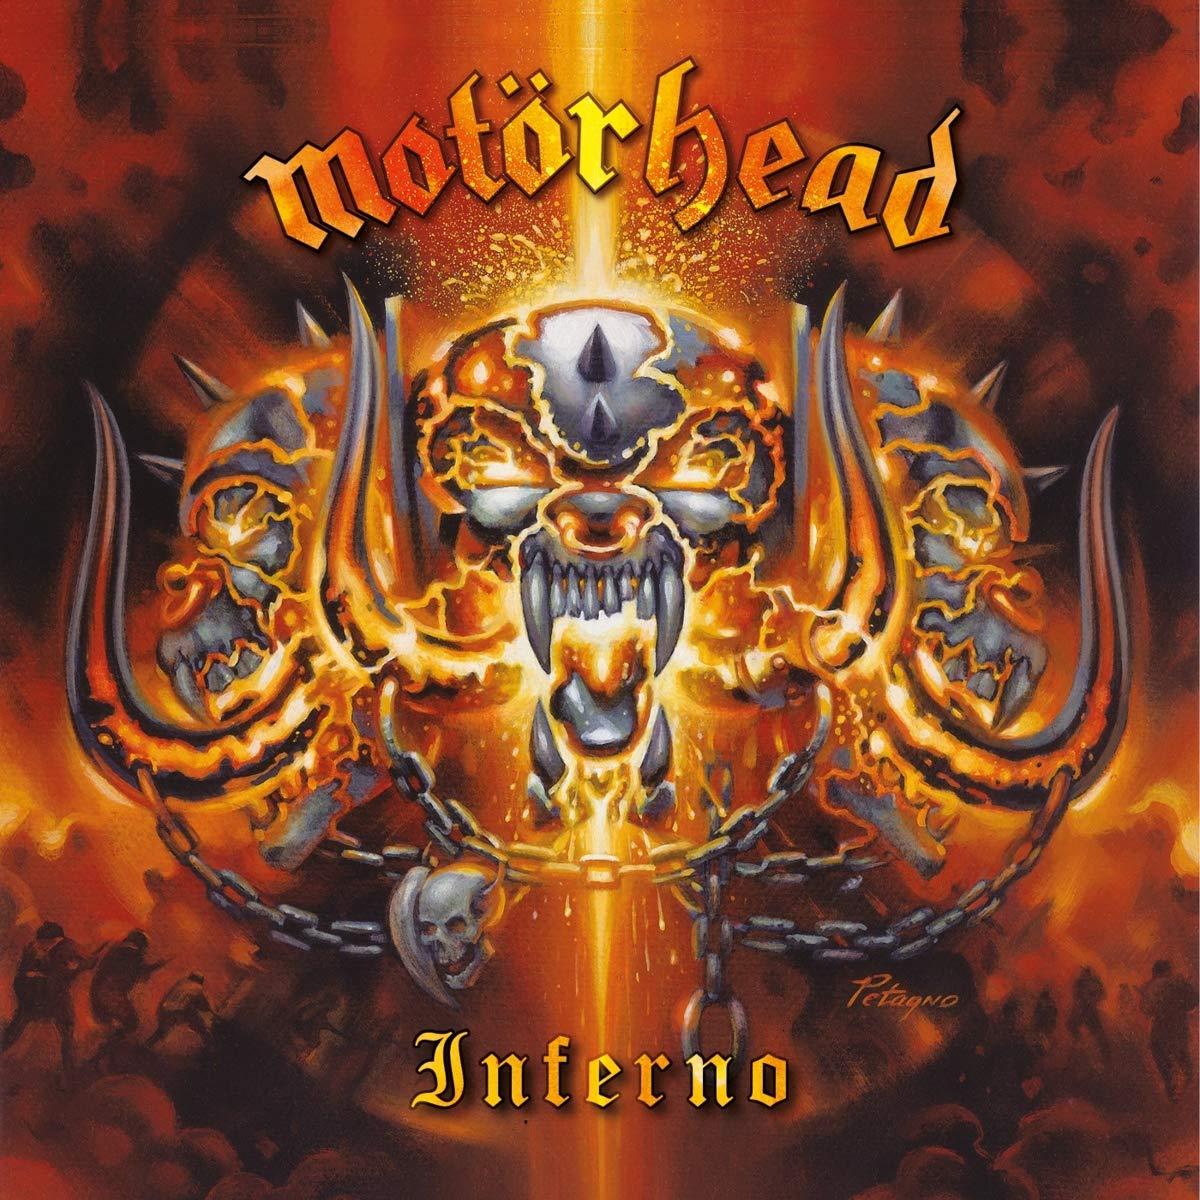 Motörhead - Inferno - Amazon.com Music